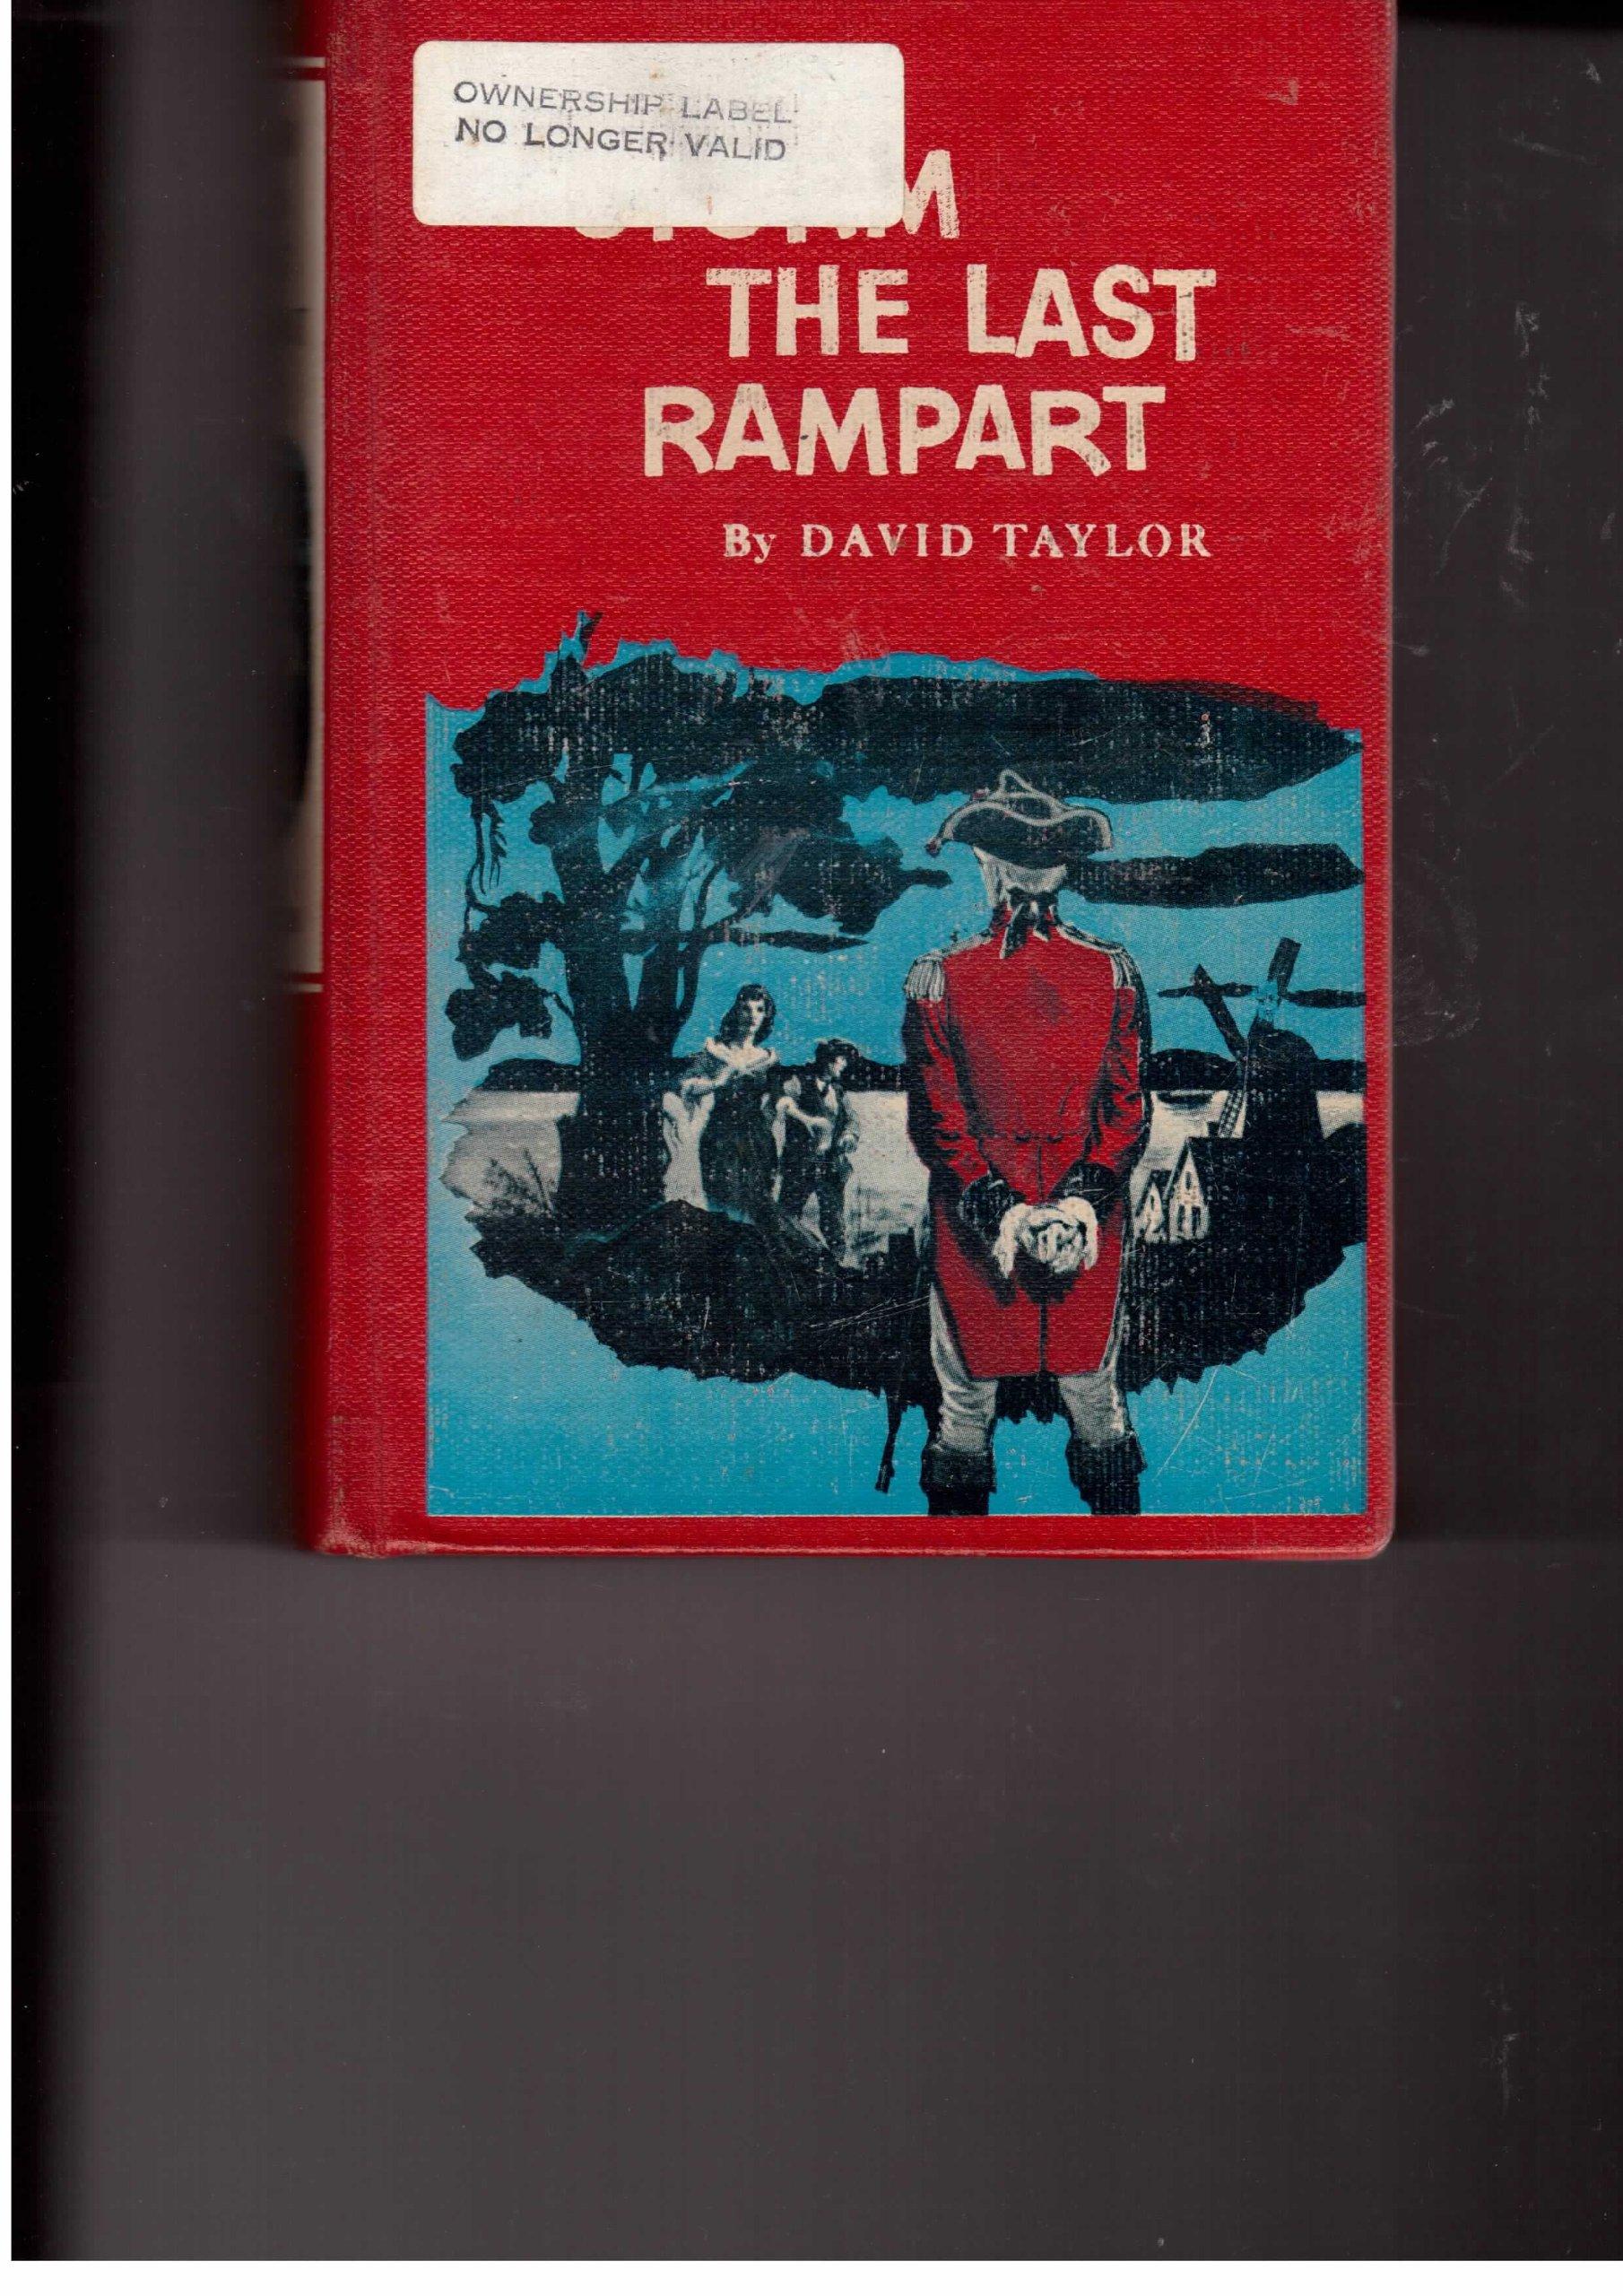 The Last Rampart